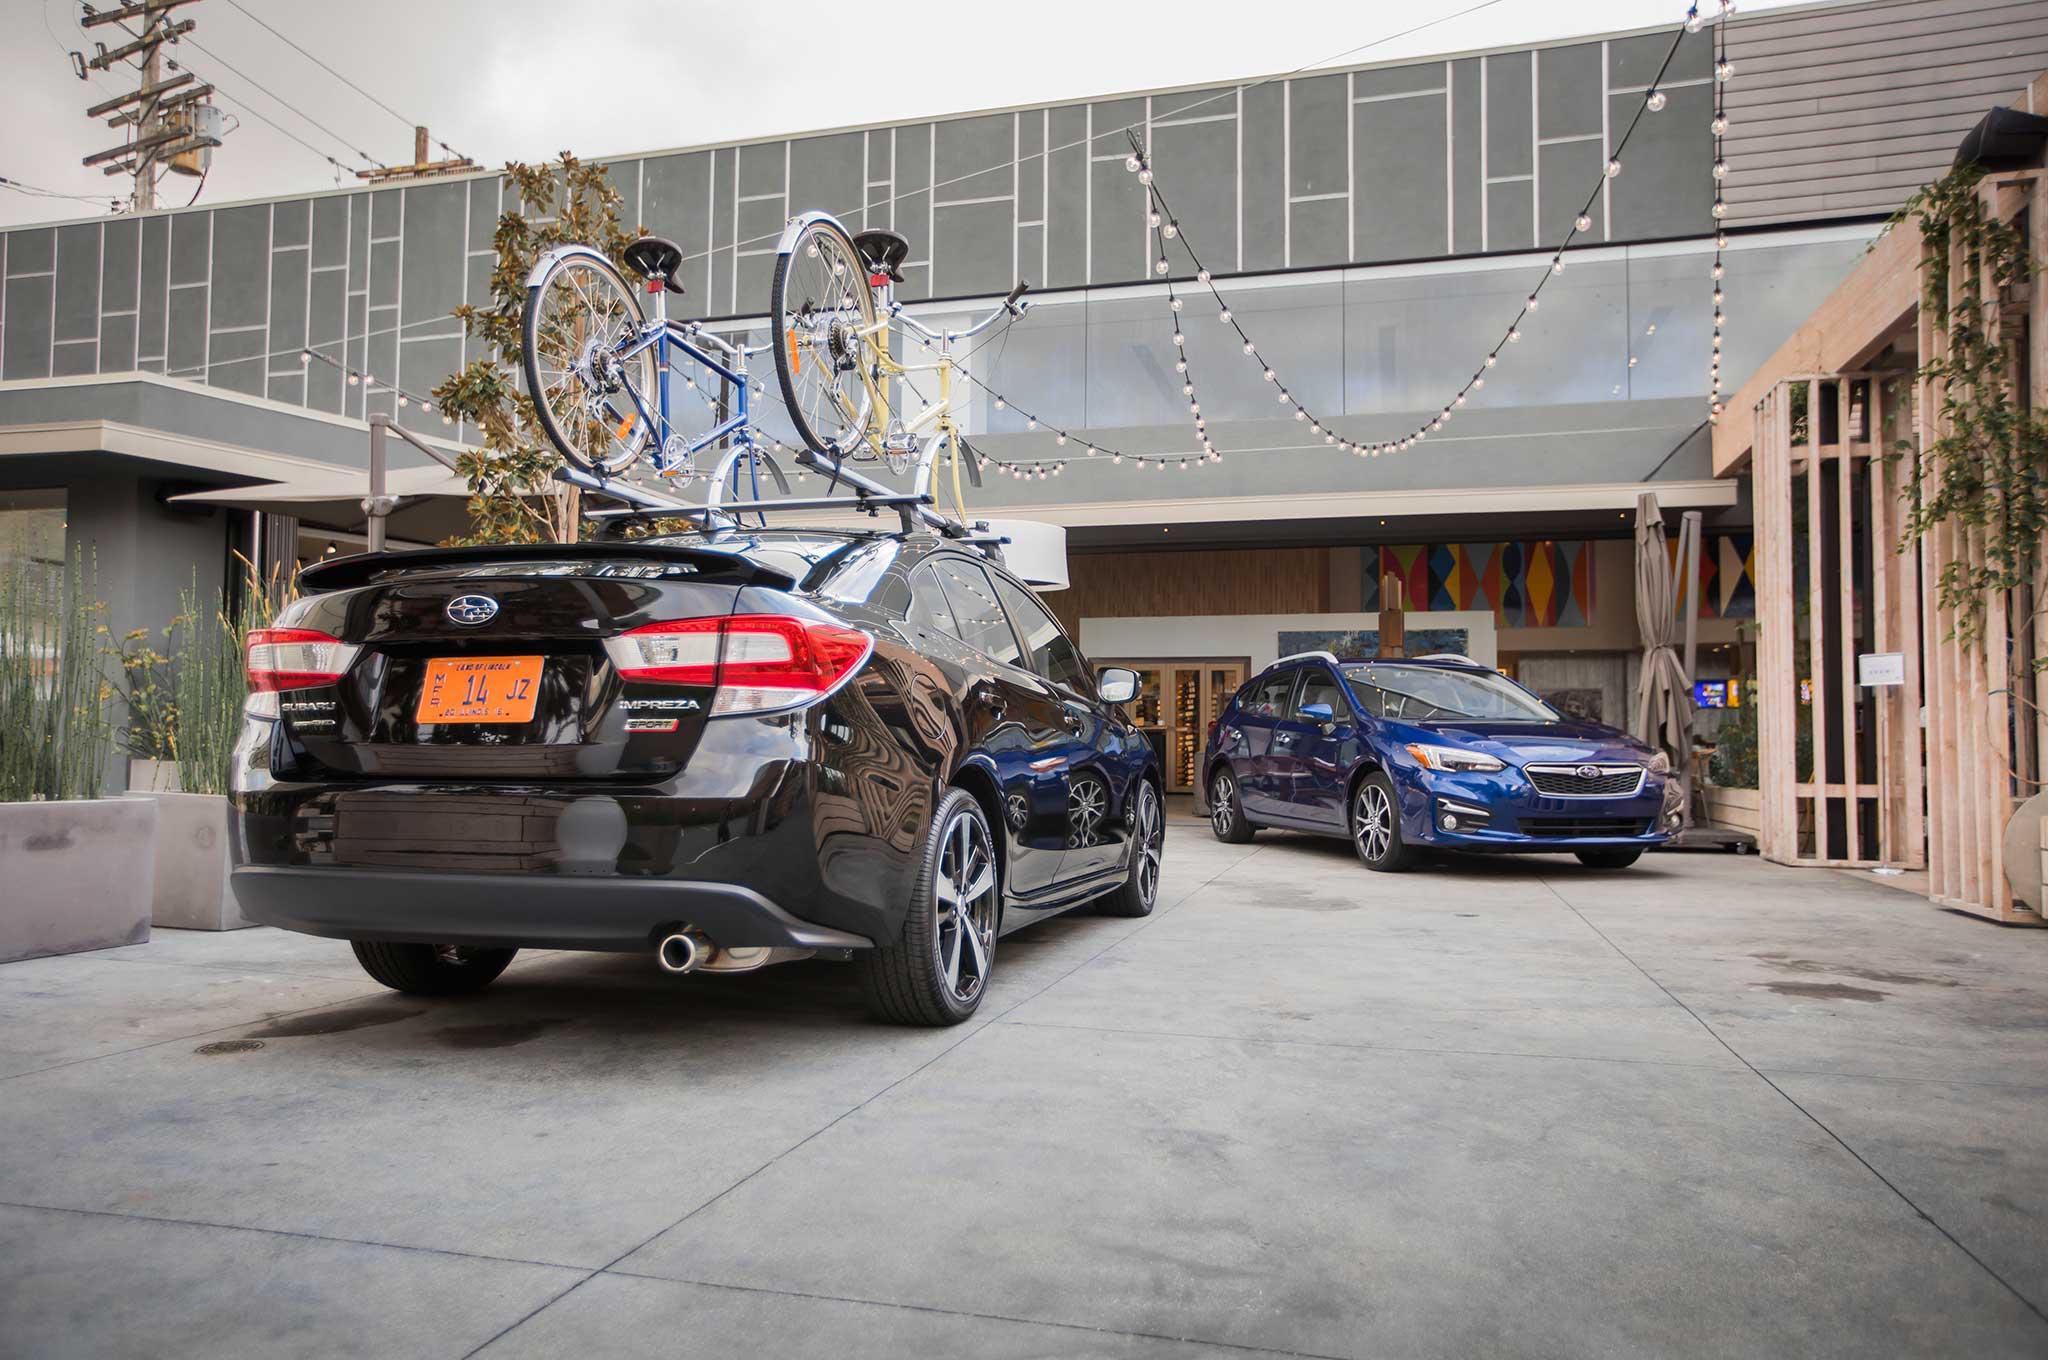 6 Things to Know About the '17 Subaru Impreza